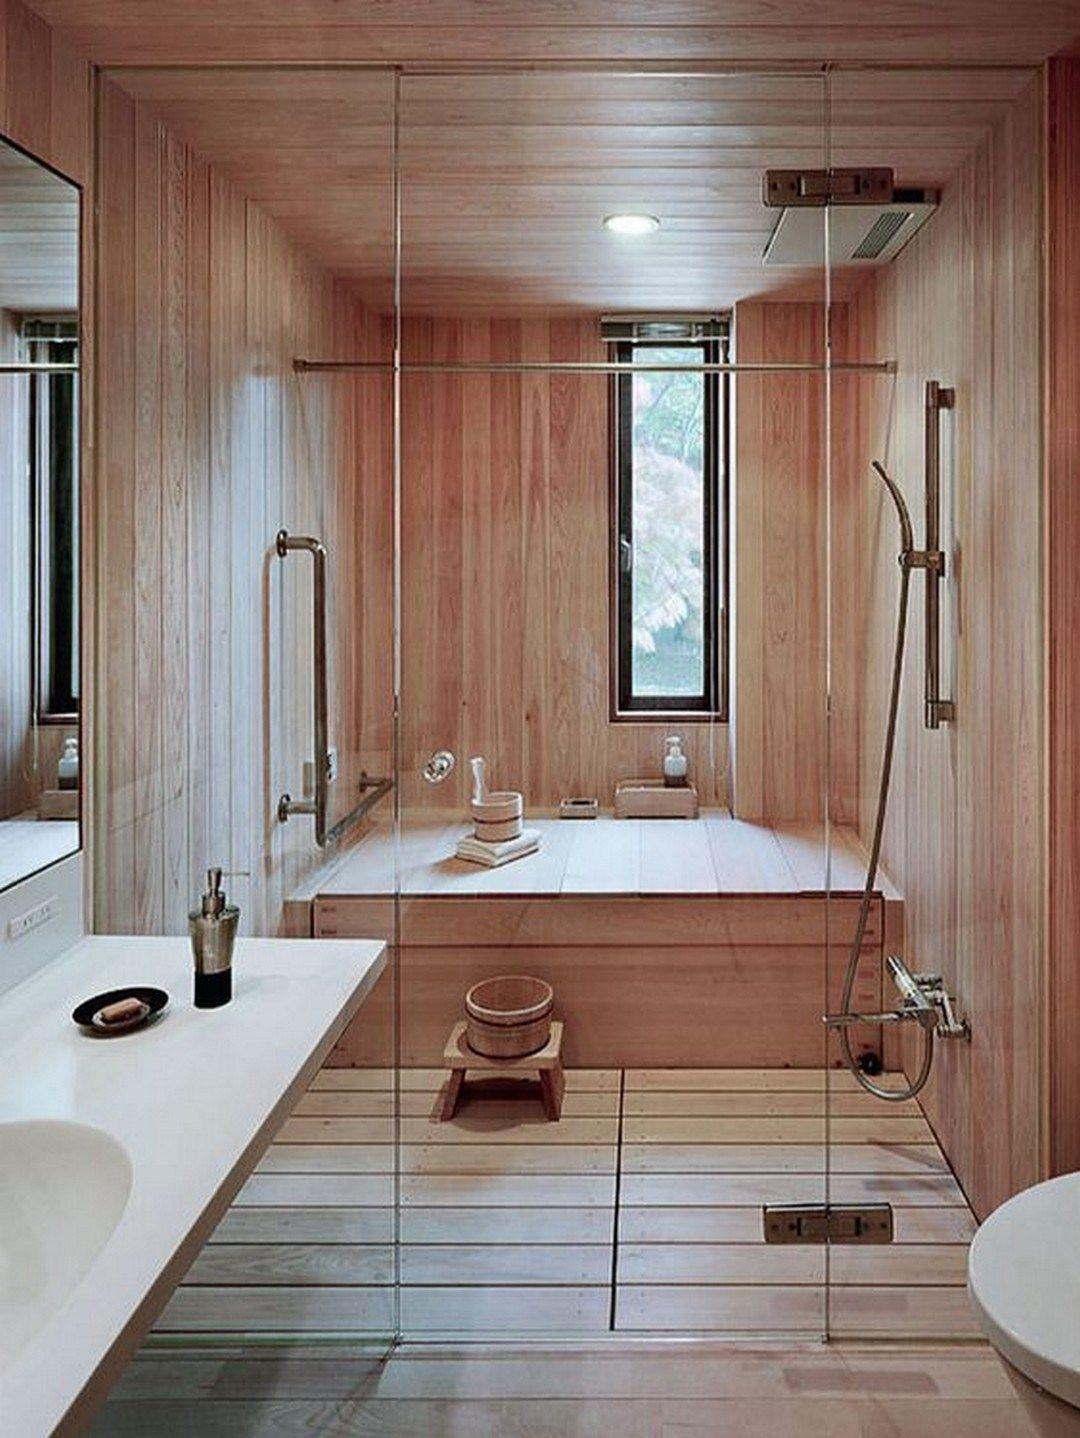 Japanese Bathtub Master Bathroom Interior Design 2 Japanese